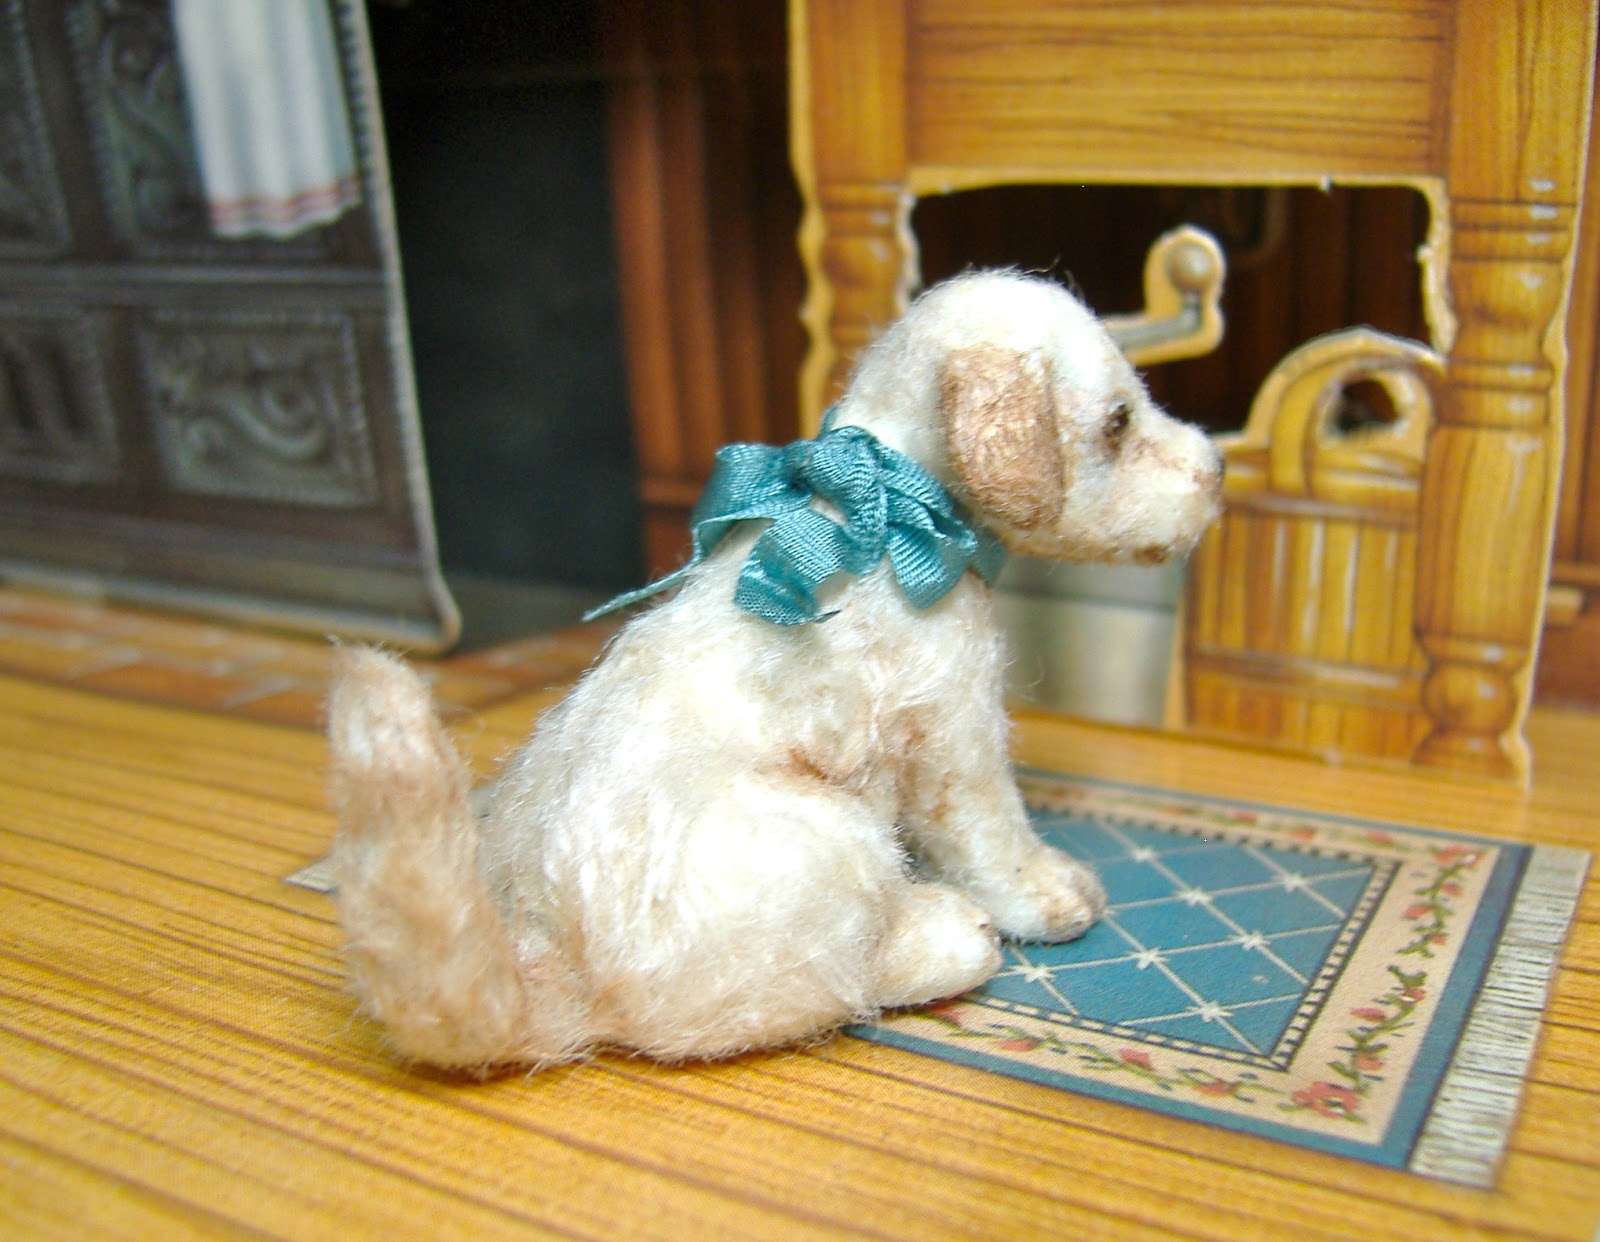 Little Puppy Toys : Morena ciambra dreamartdolls ebay little puppy dog